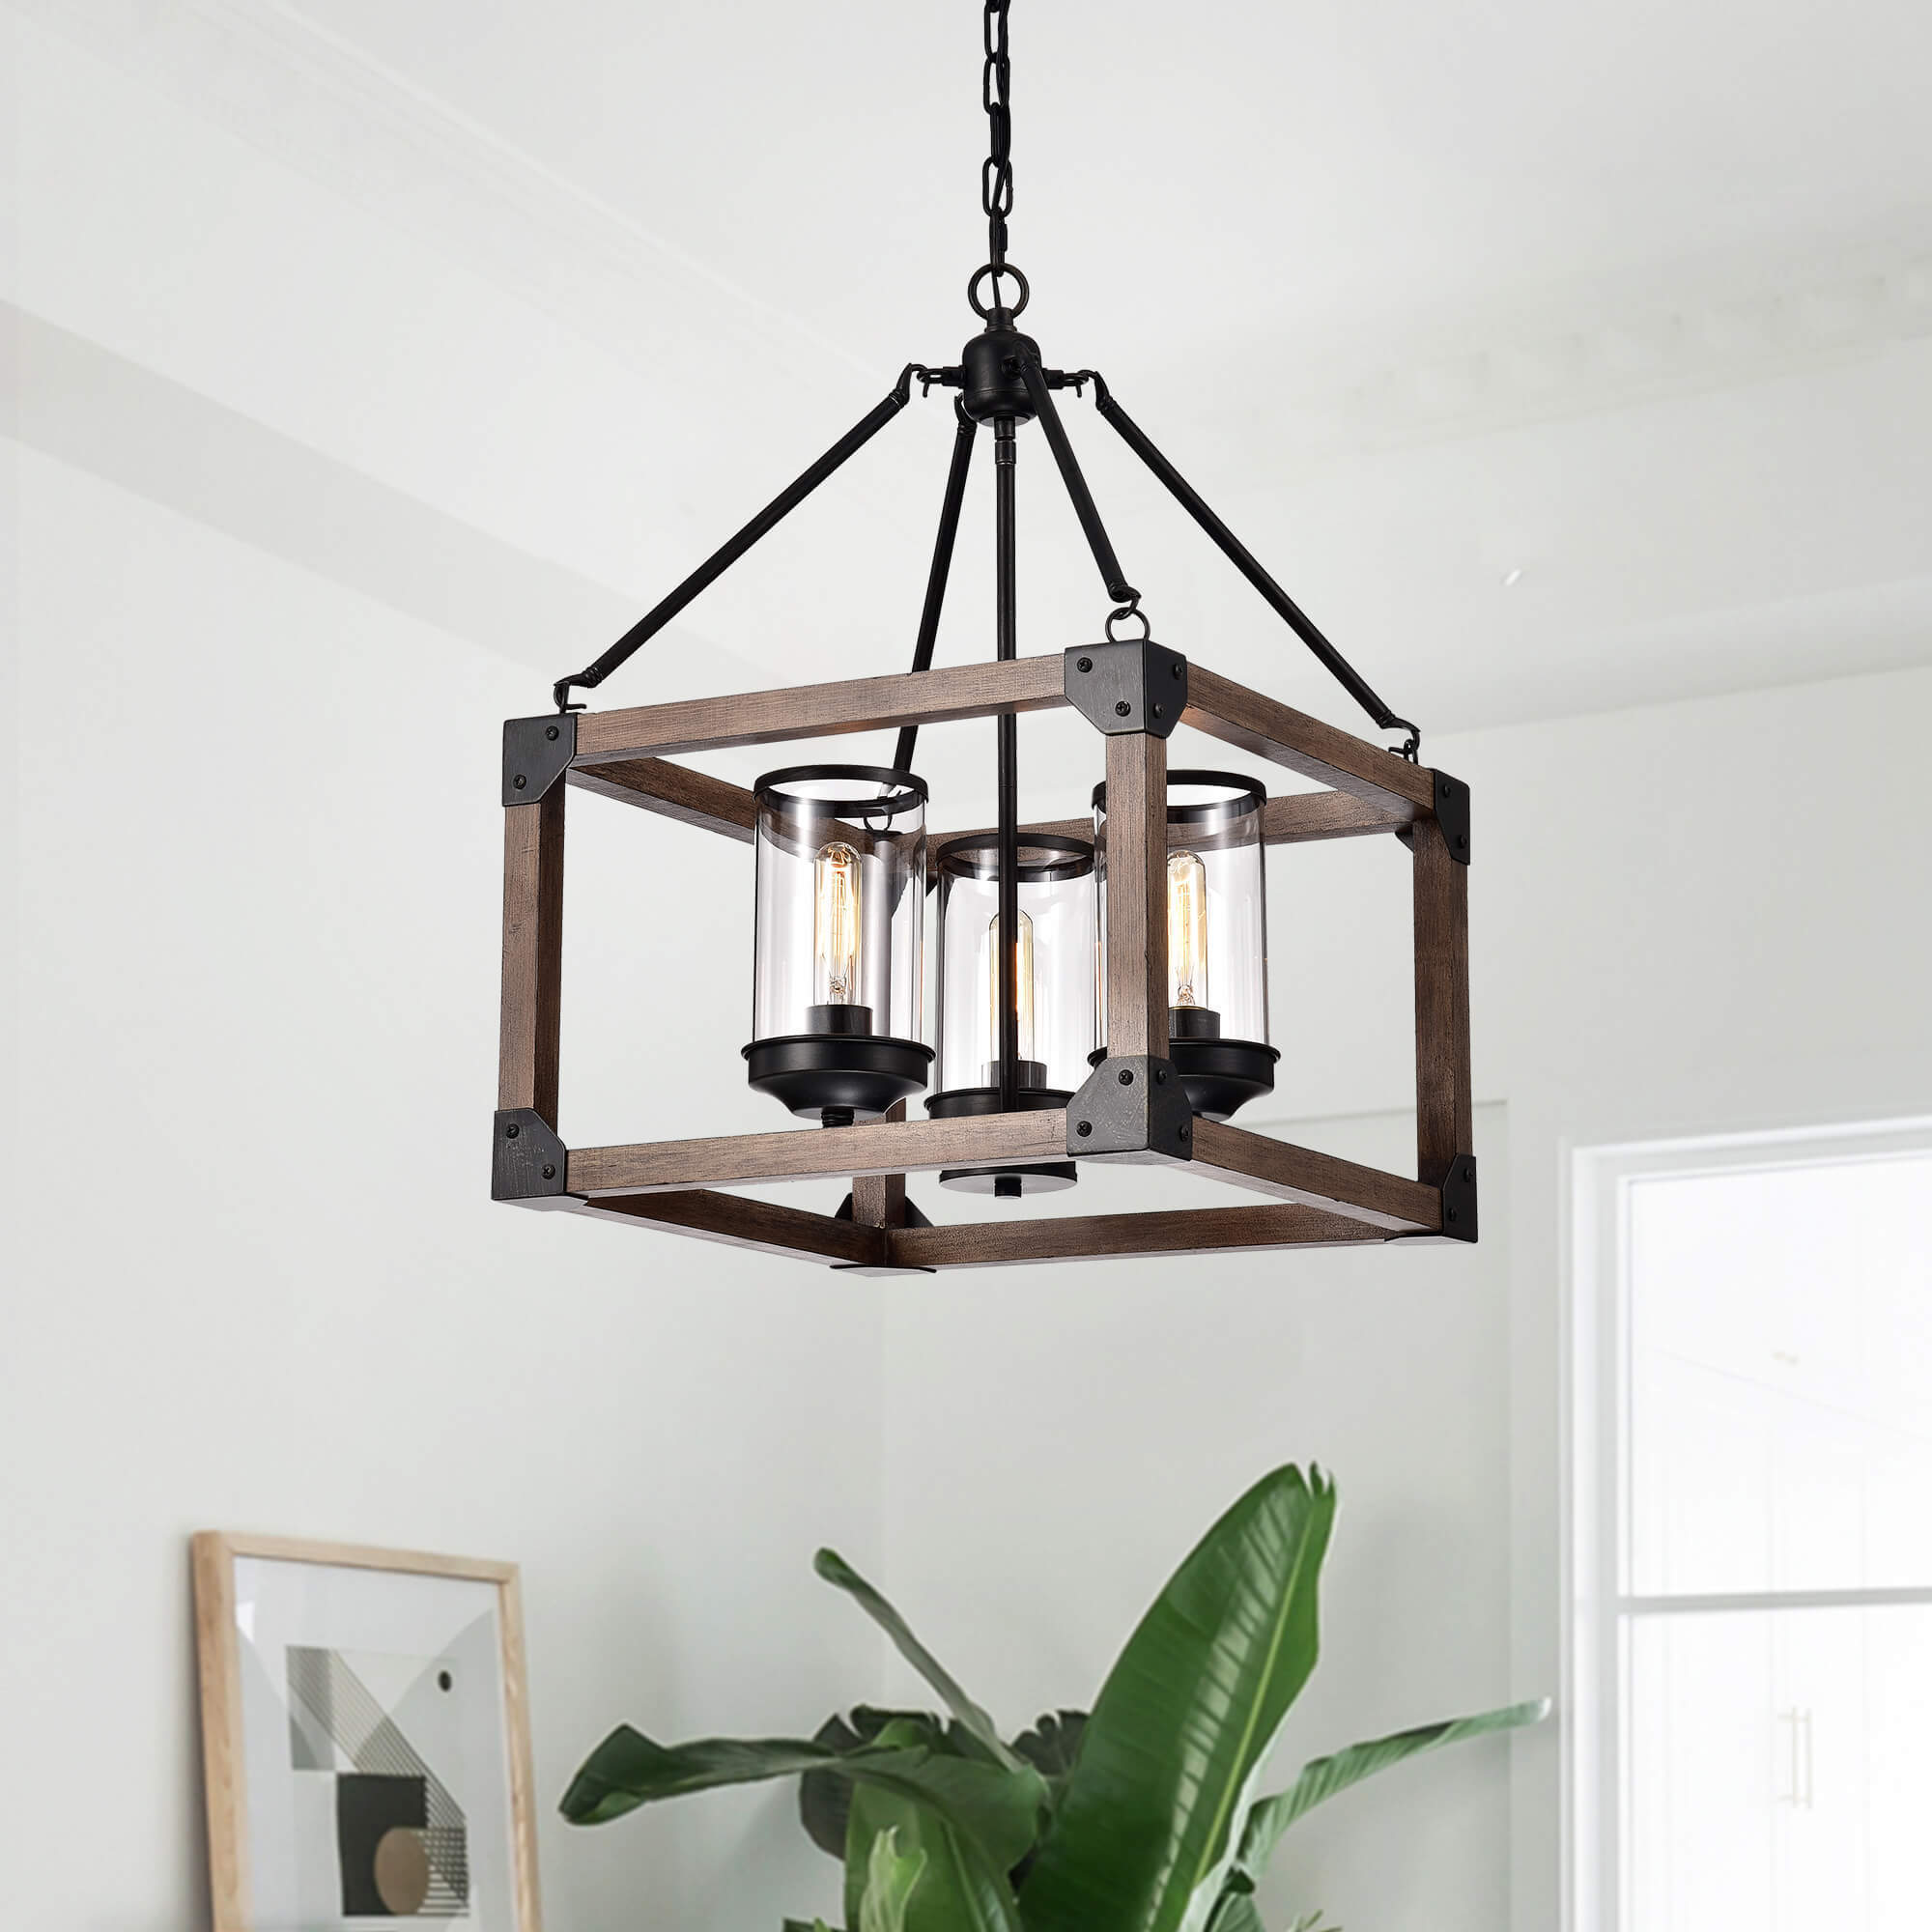 Bedroom Ceiling Lighting | Shop our Best Lighting & Ceiling Fans ...